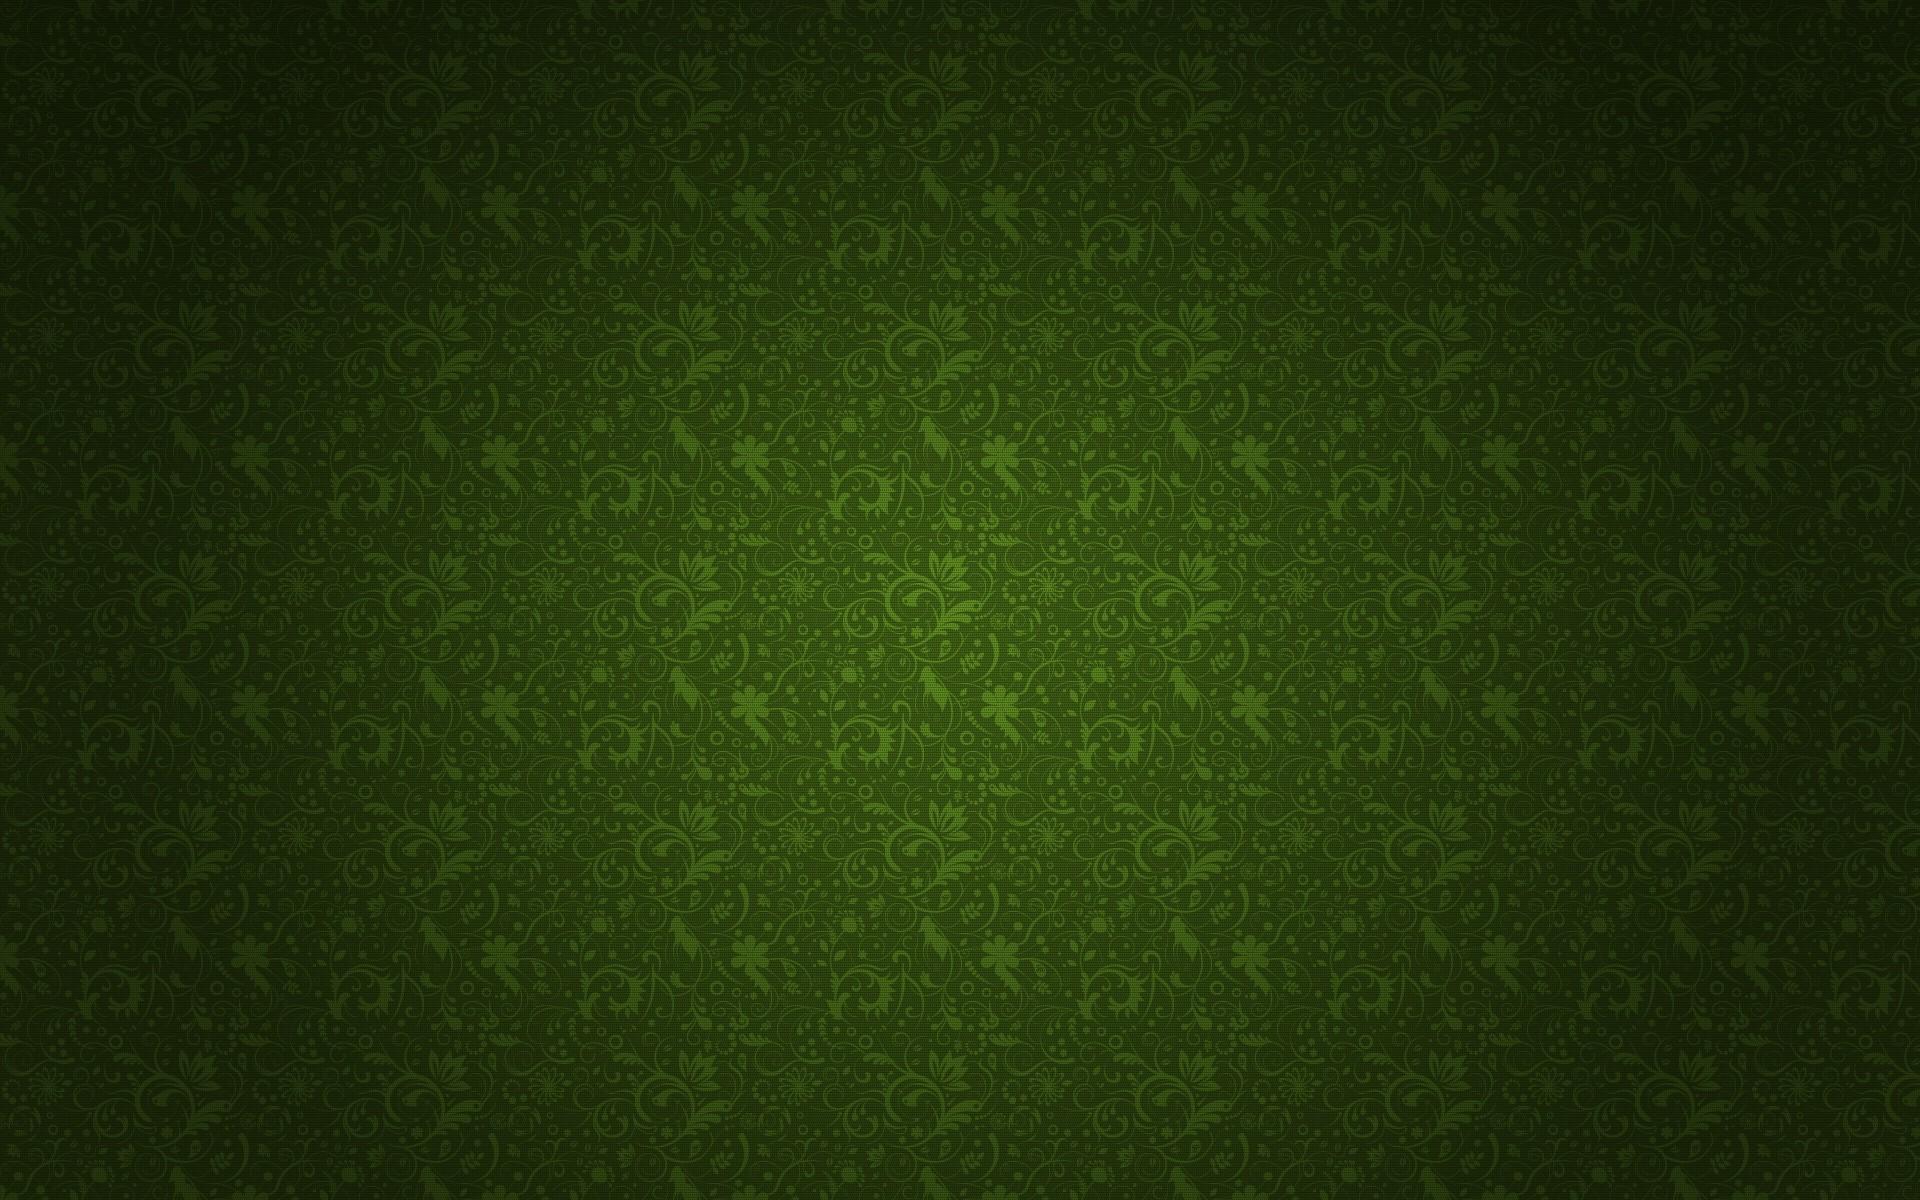 Res: 1920x1200, Olive Green Wallpaper - Wallpapersafari with Olive Green Wallpaper